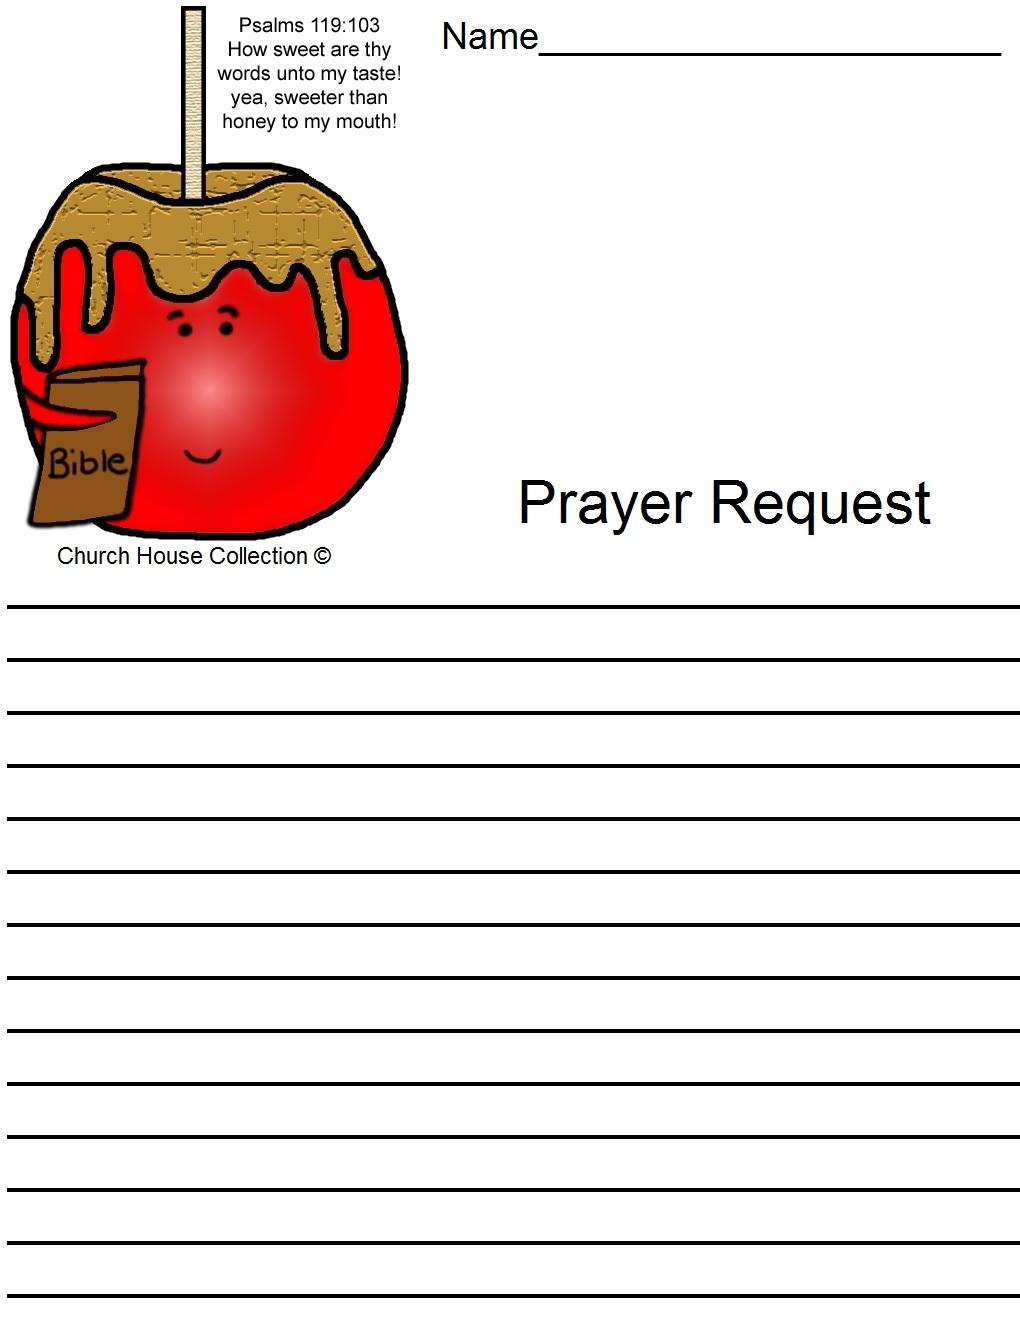 prayer essay Prayer in public schools essay writing service, custom prayer in public schools papers, term papers, free prayer in public schools samples, research papers, help.